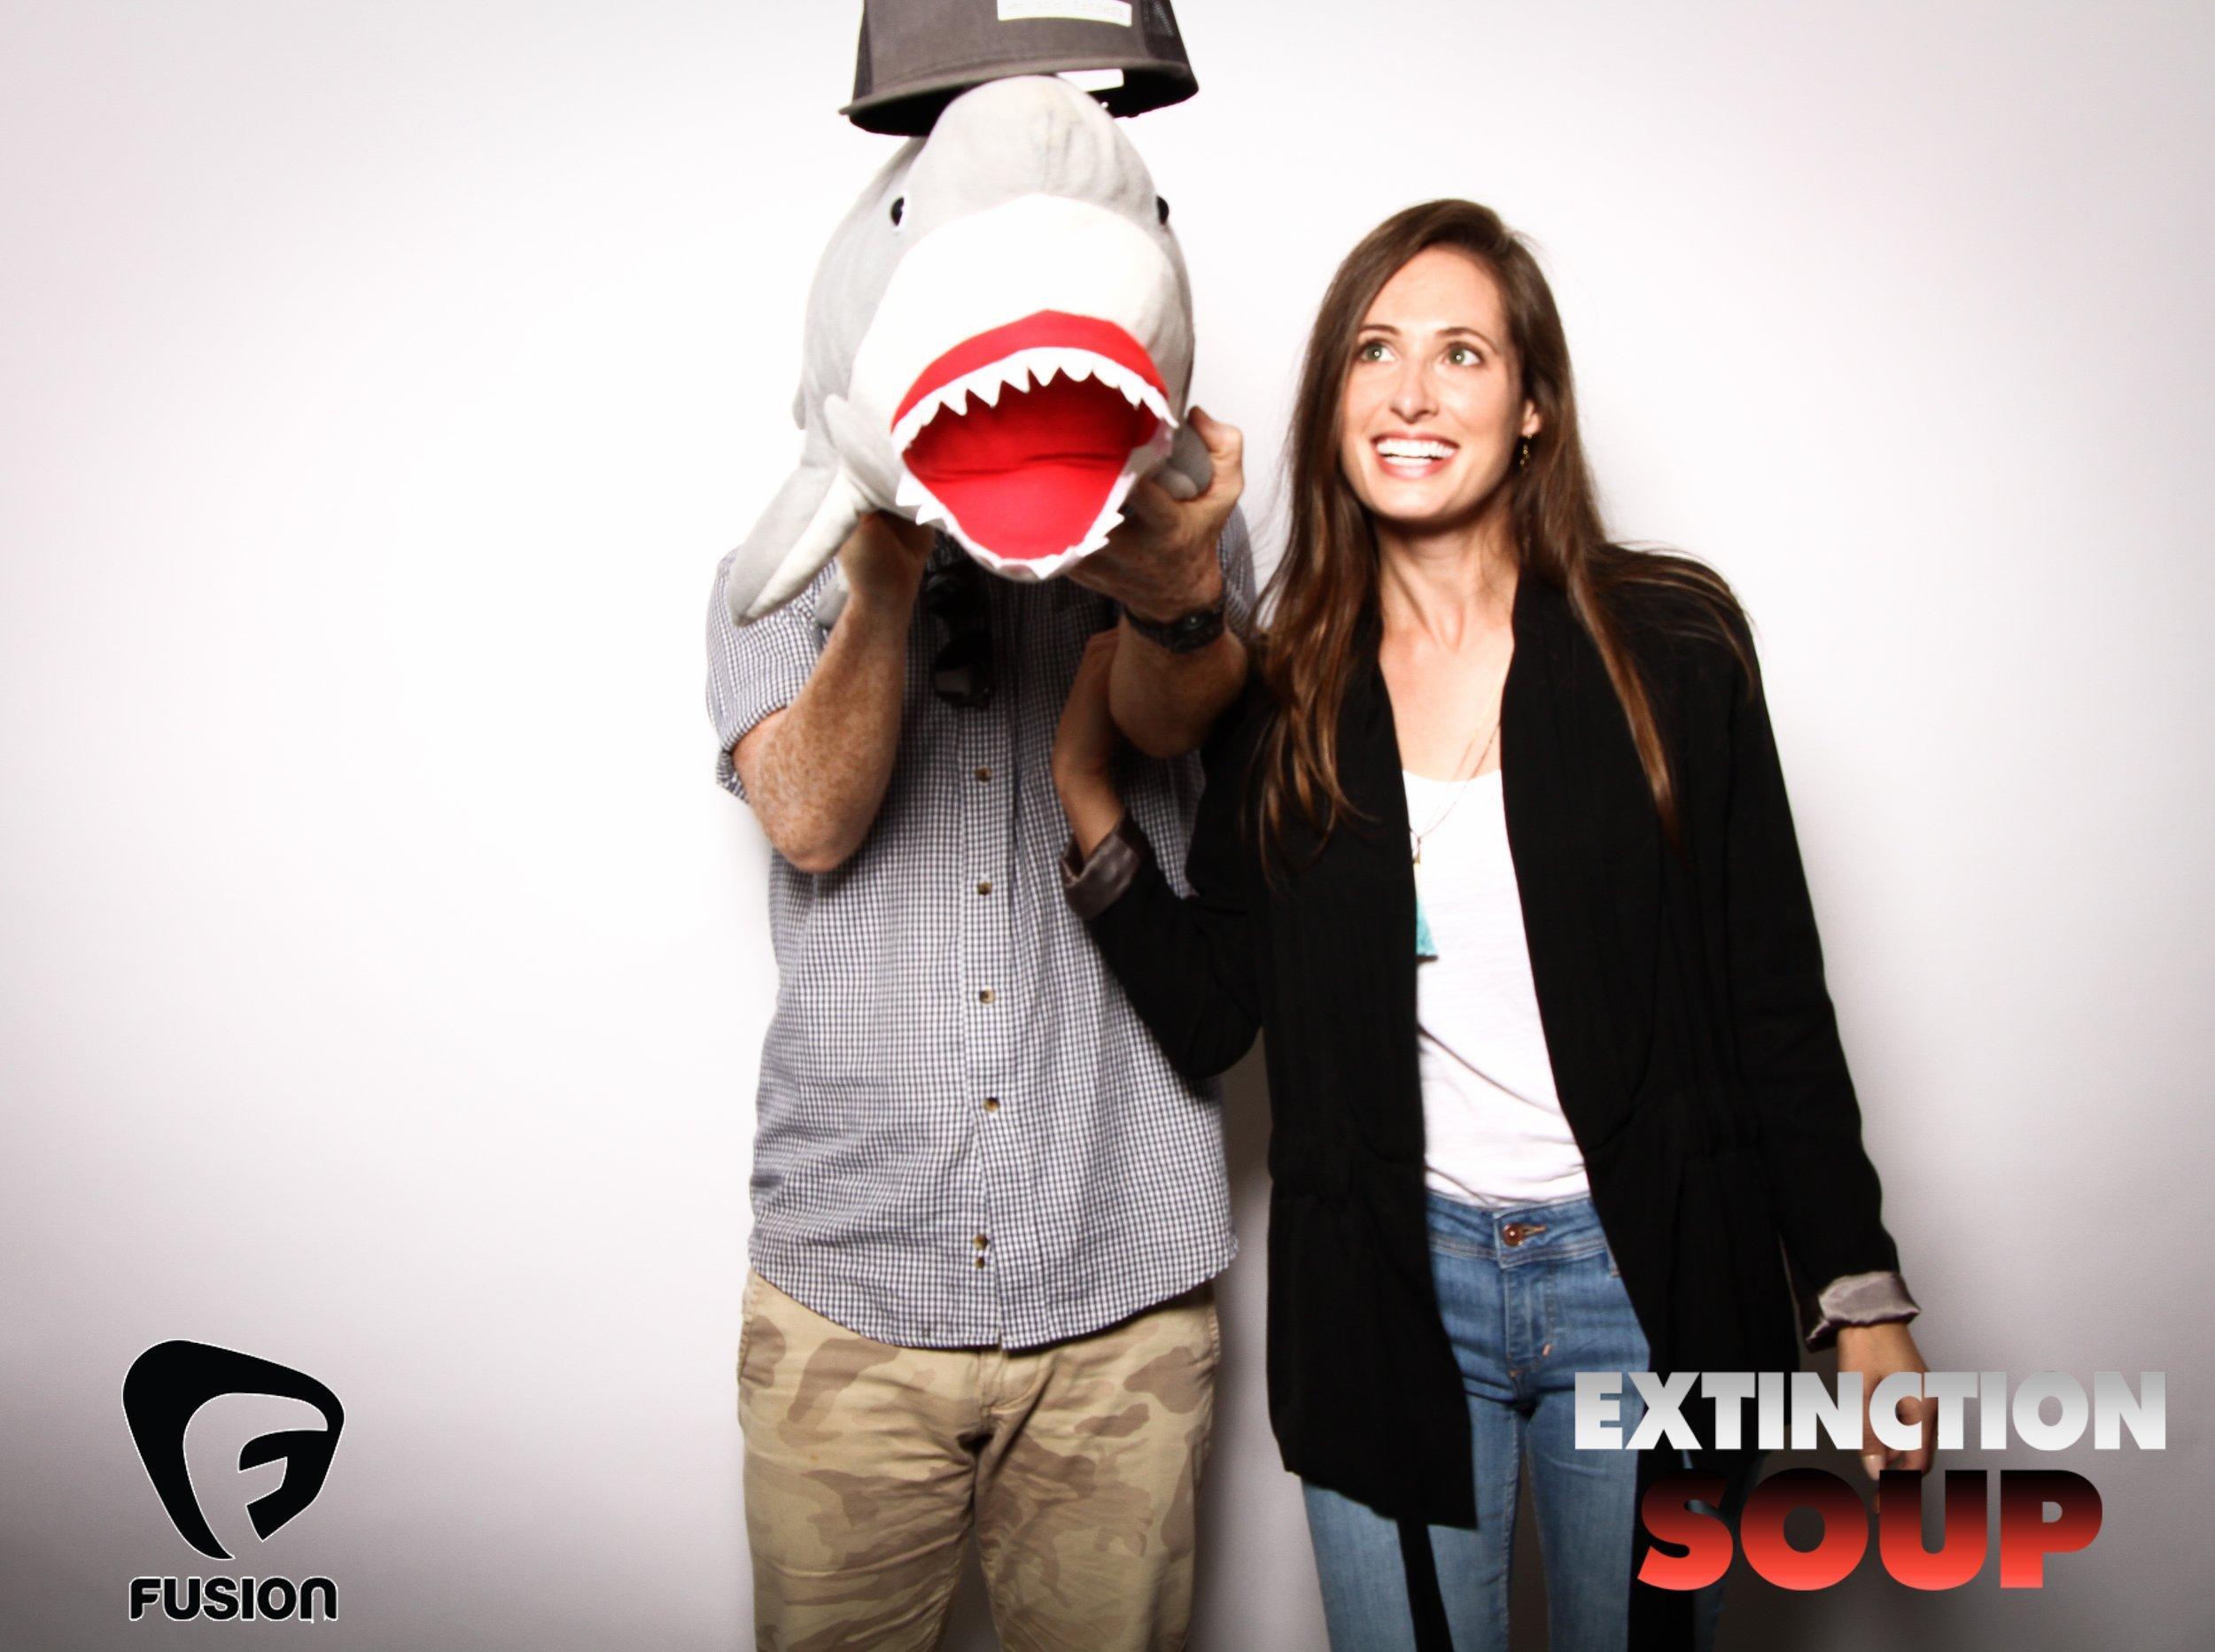 Photo booth fun with shark 7